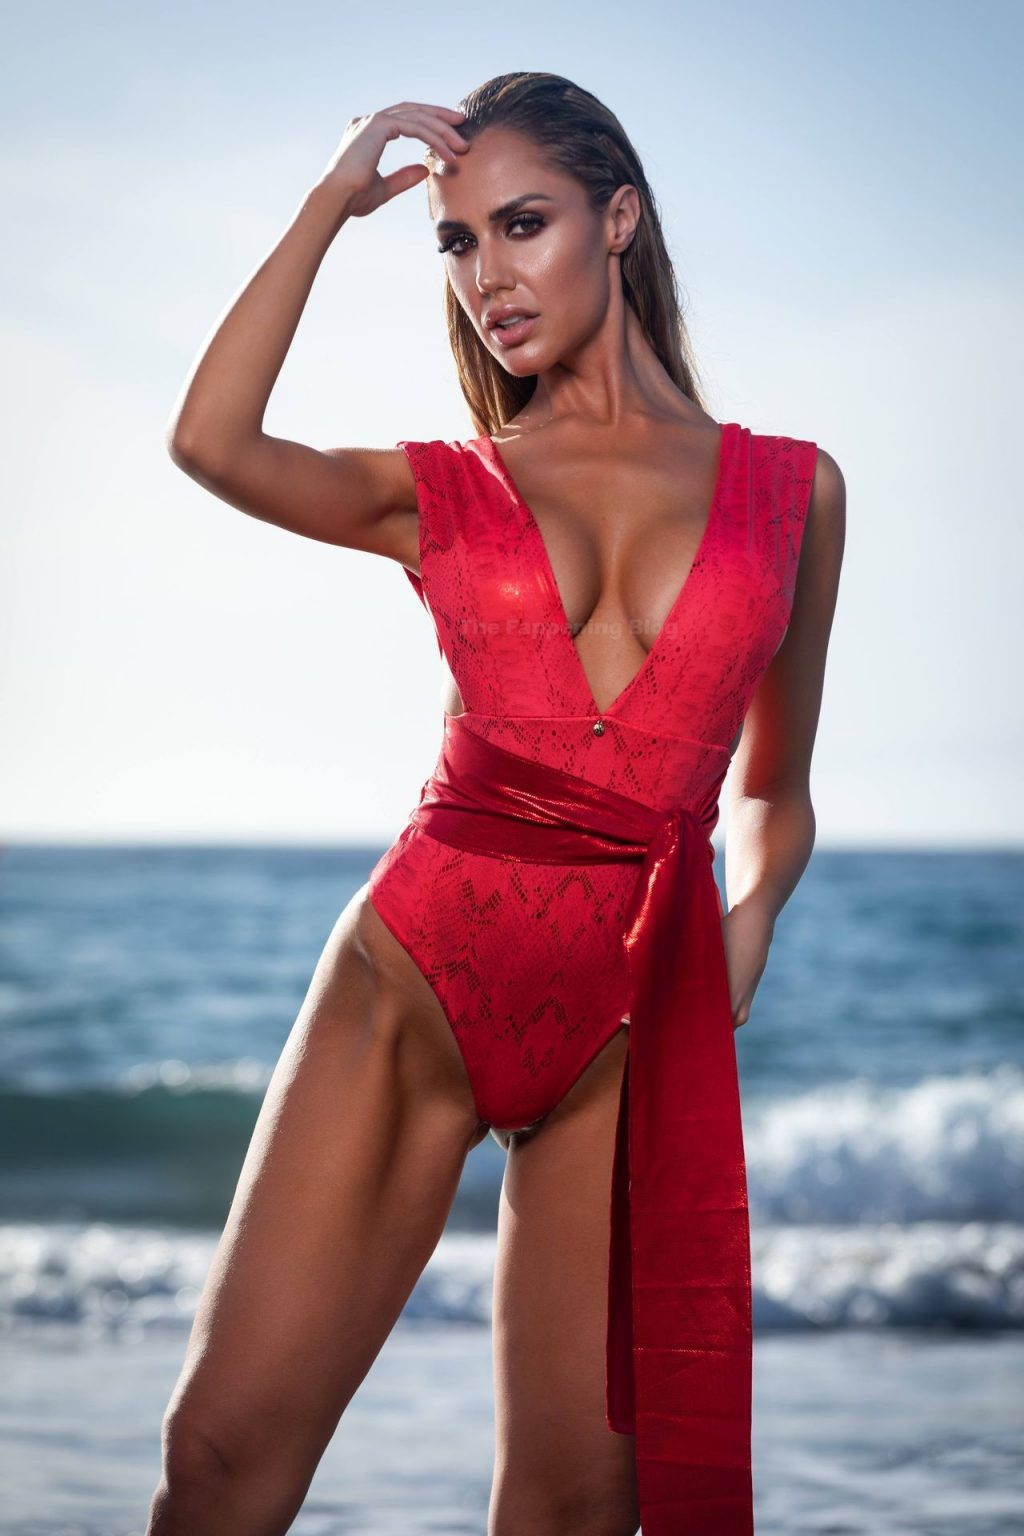 Miss Universe Spain 2020 Candidates (8 Photos)